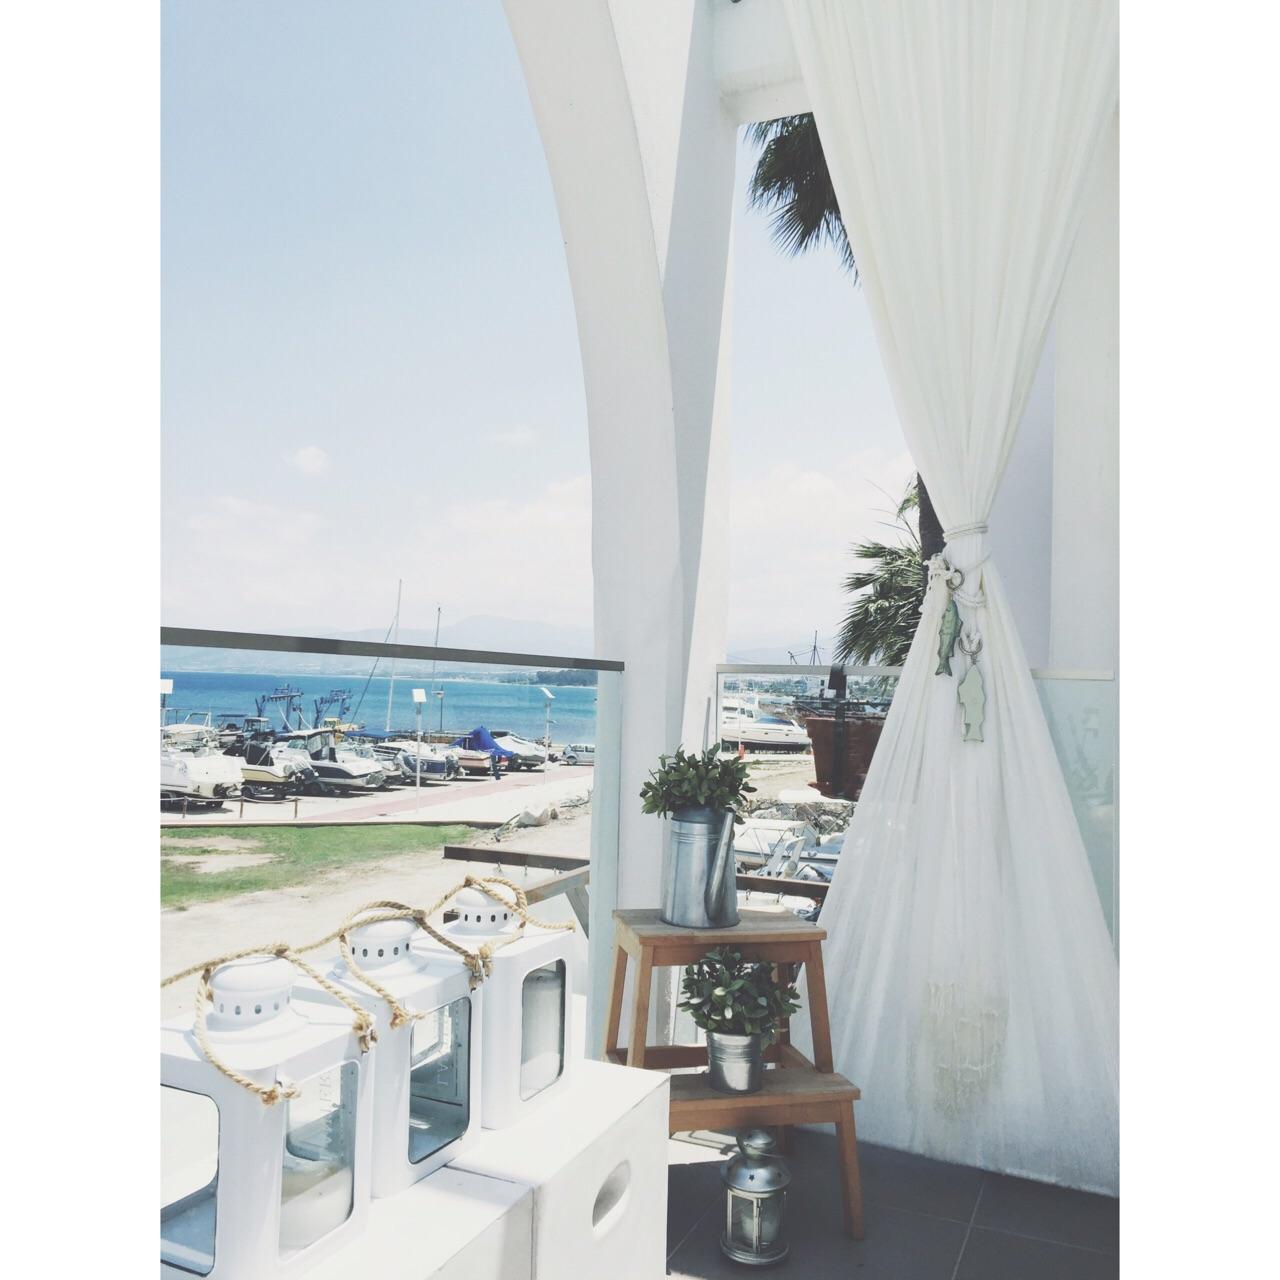 View of Latchi marina from the balcony